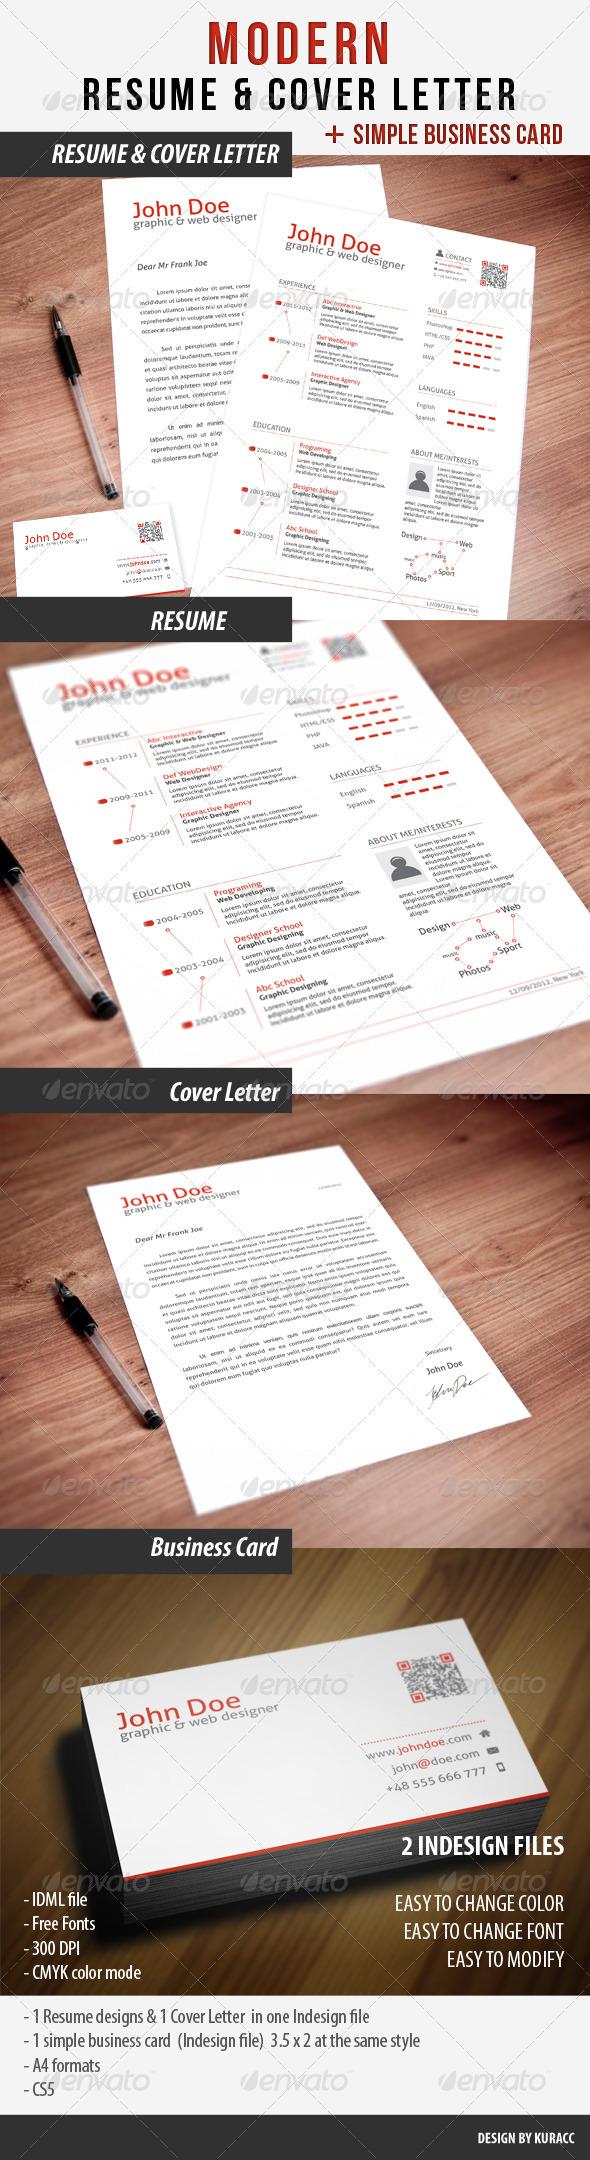 clean resume  u0026 cover letter  u0026 business card